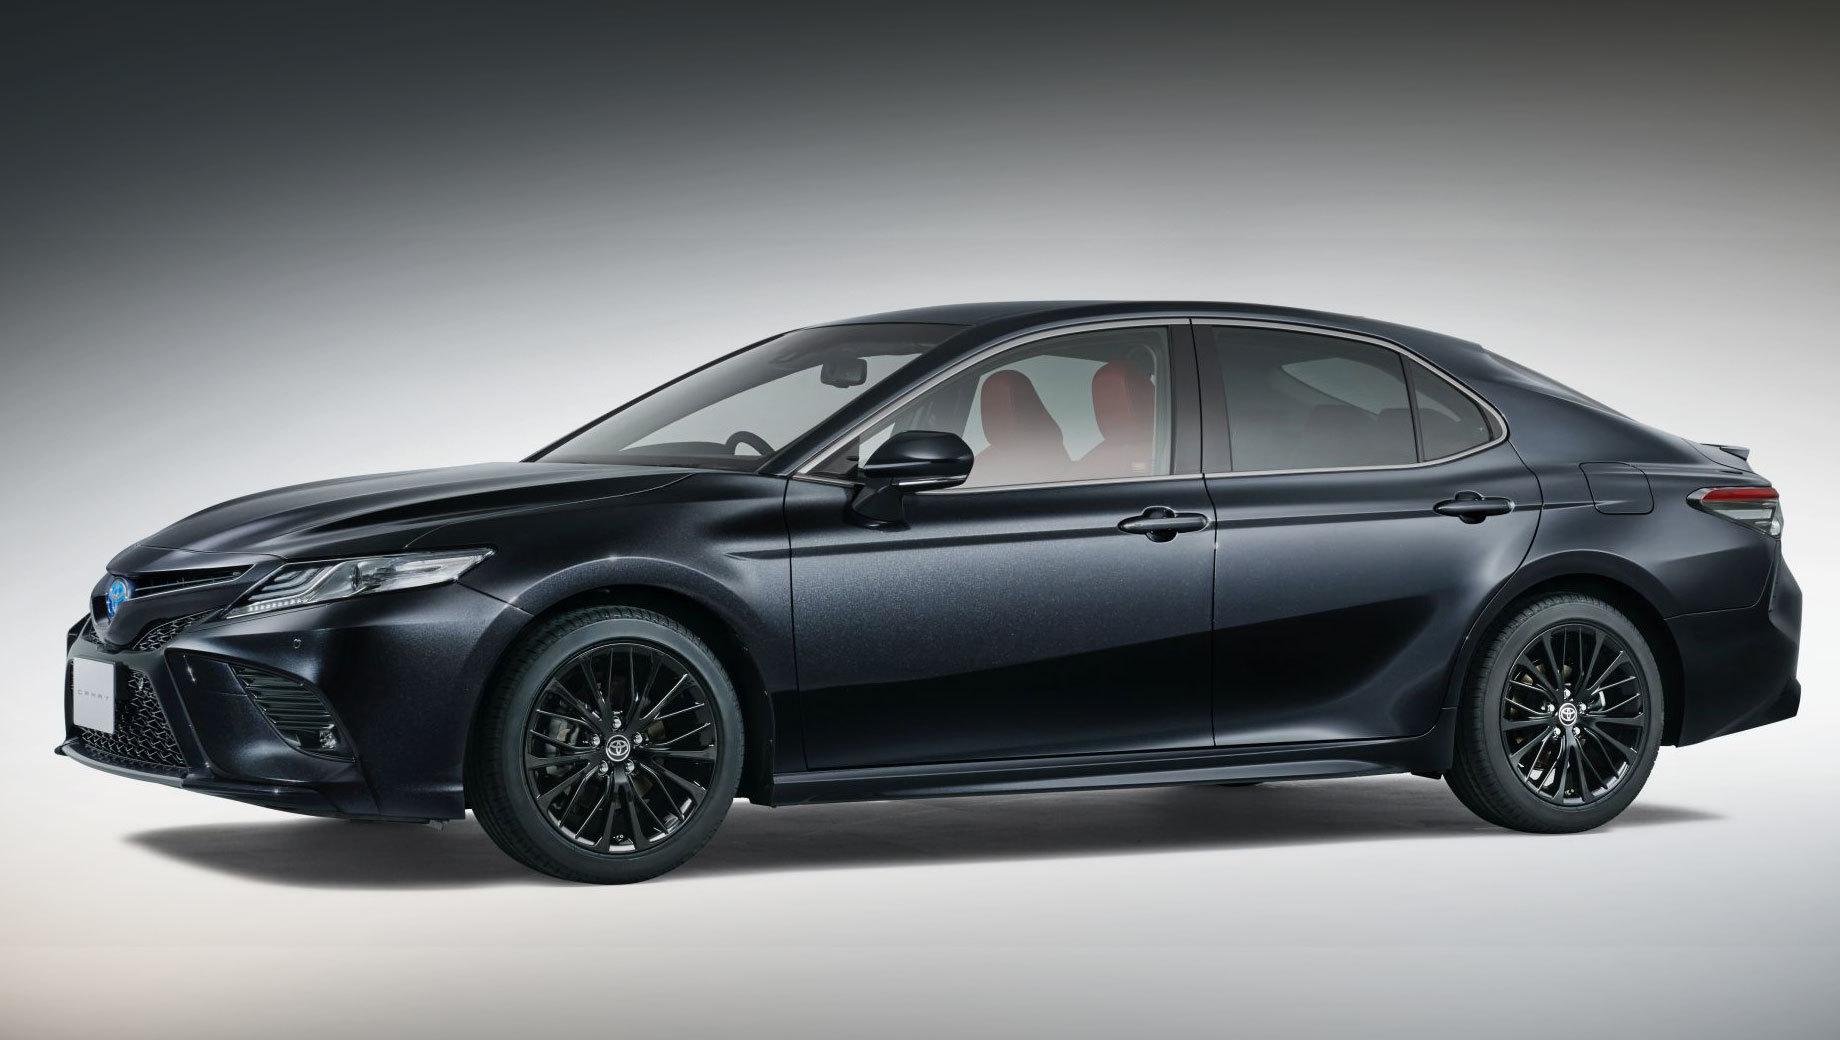 Toyota Camry отметила 40-летие версией WS Black Edition